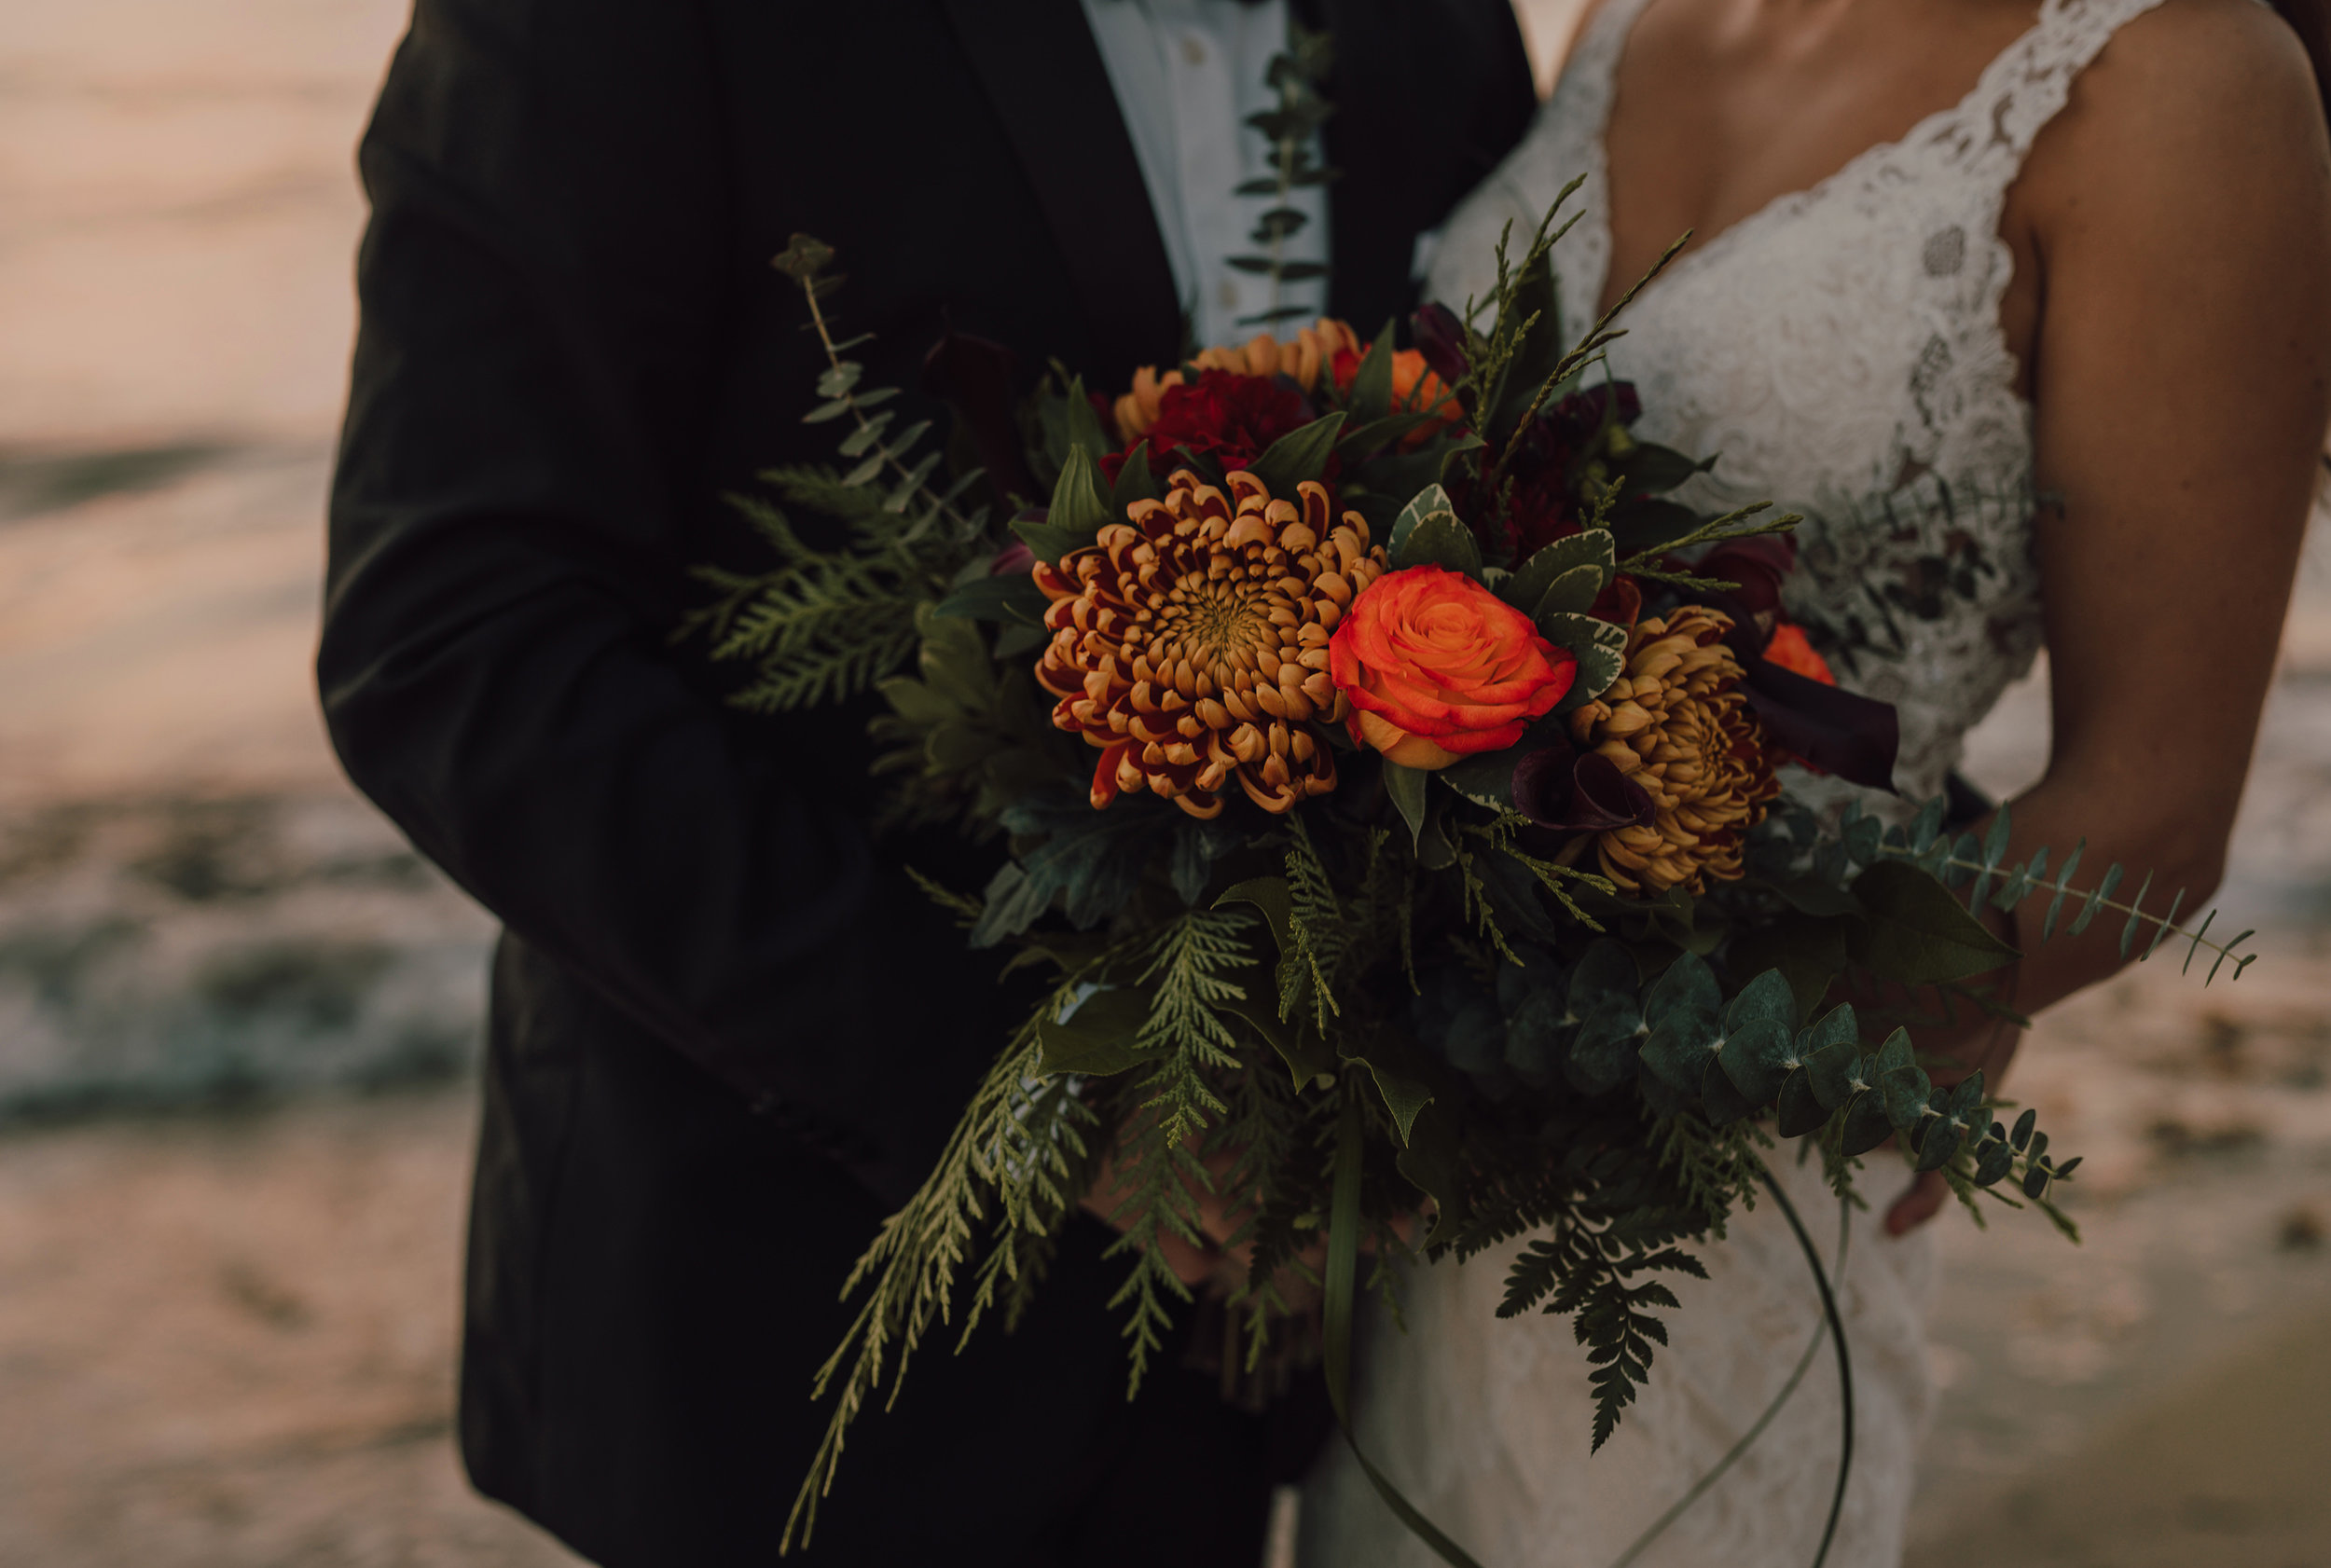 Day After Wedding Photos - Sunshine Coast Wedding Photos - Sunset Wedding Photos - Vancouver Wedding Photographer & Videographer - Sunshine Coast Wedding Photos - Sunshine Coast Wedding Photographer - Jennifer Picard Photography - 1A5A9249.jpg